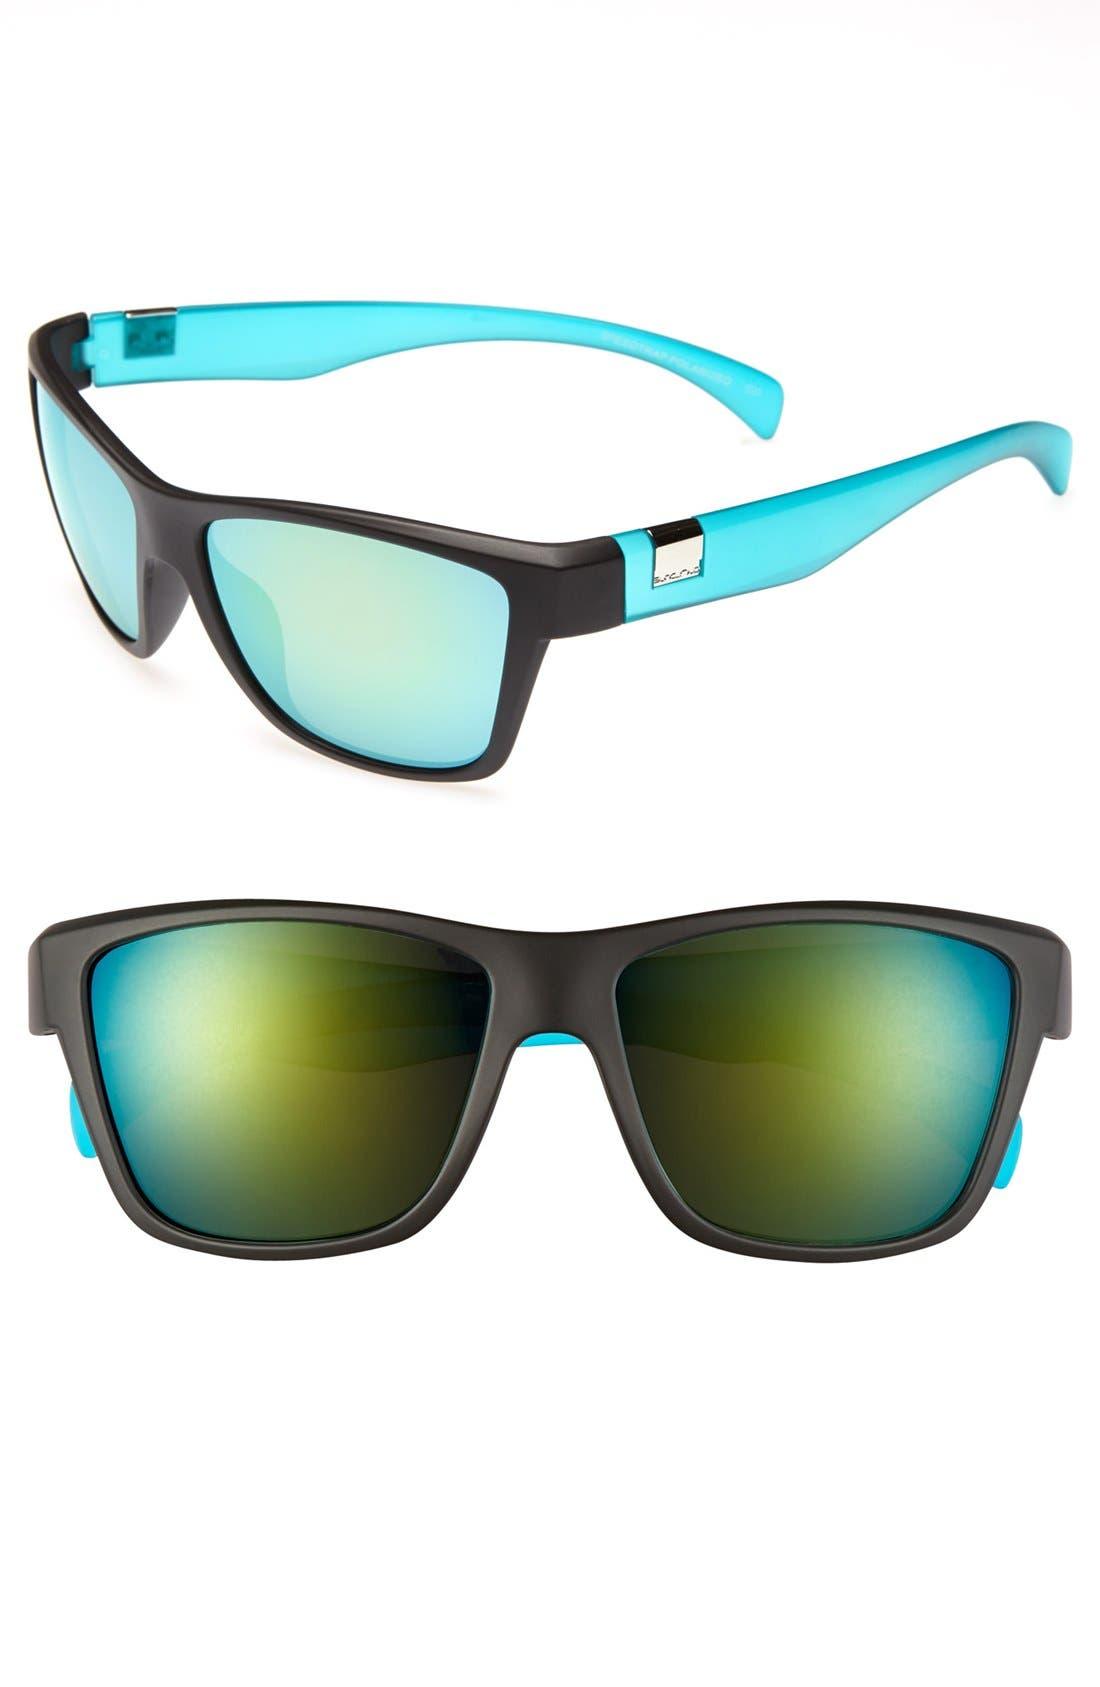 Main Image - Suncloud 'Speedtrap' Sunglasses